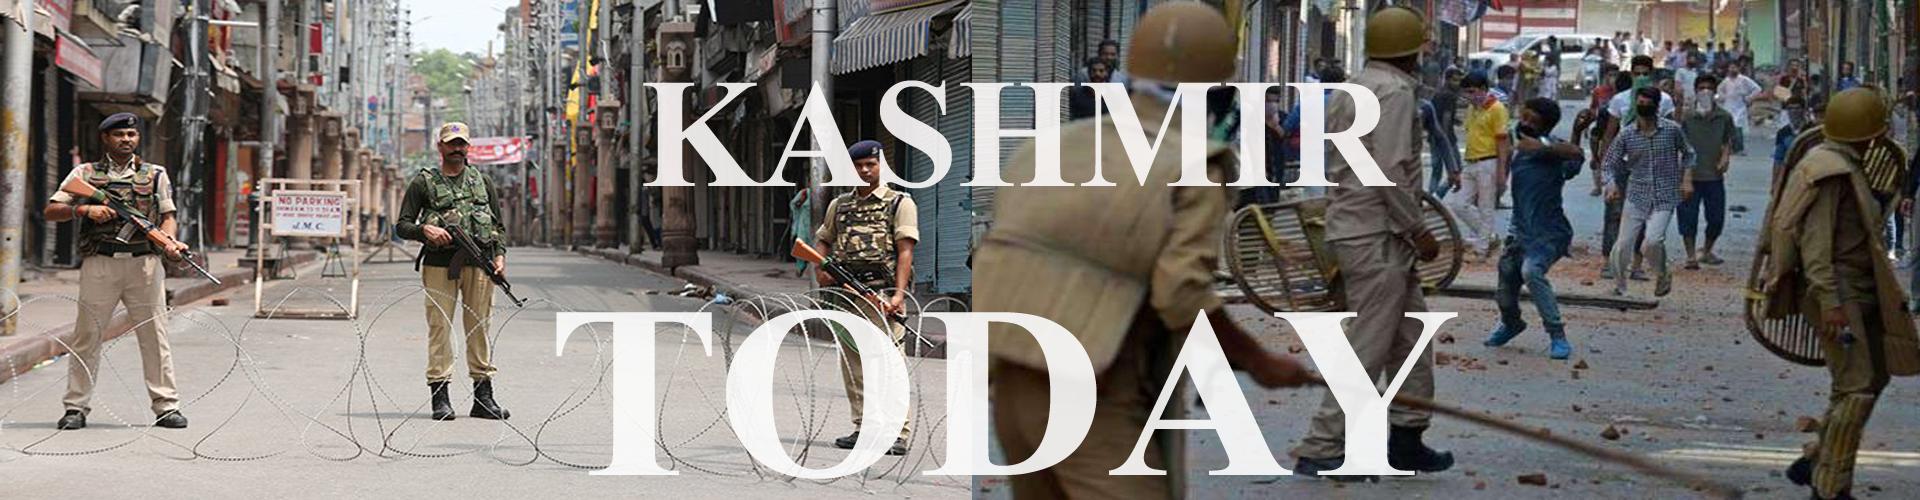 Kashmir Today Group